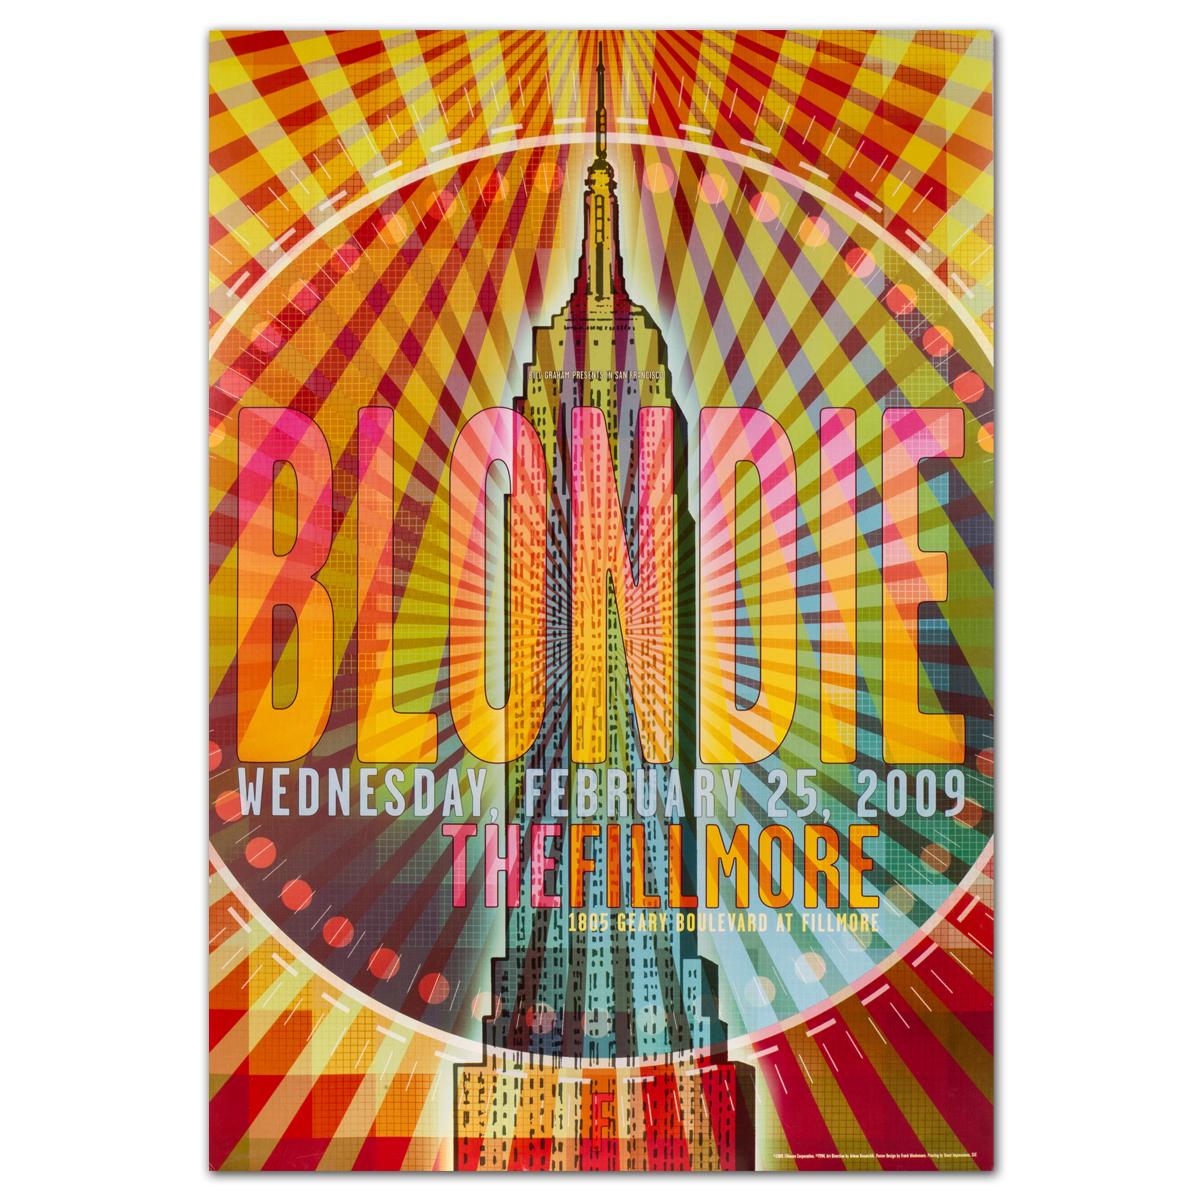 Fillmore - Blondie 2/25/2009 Poster